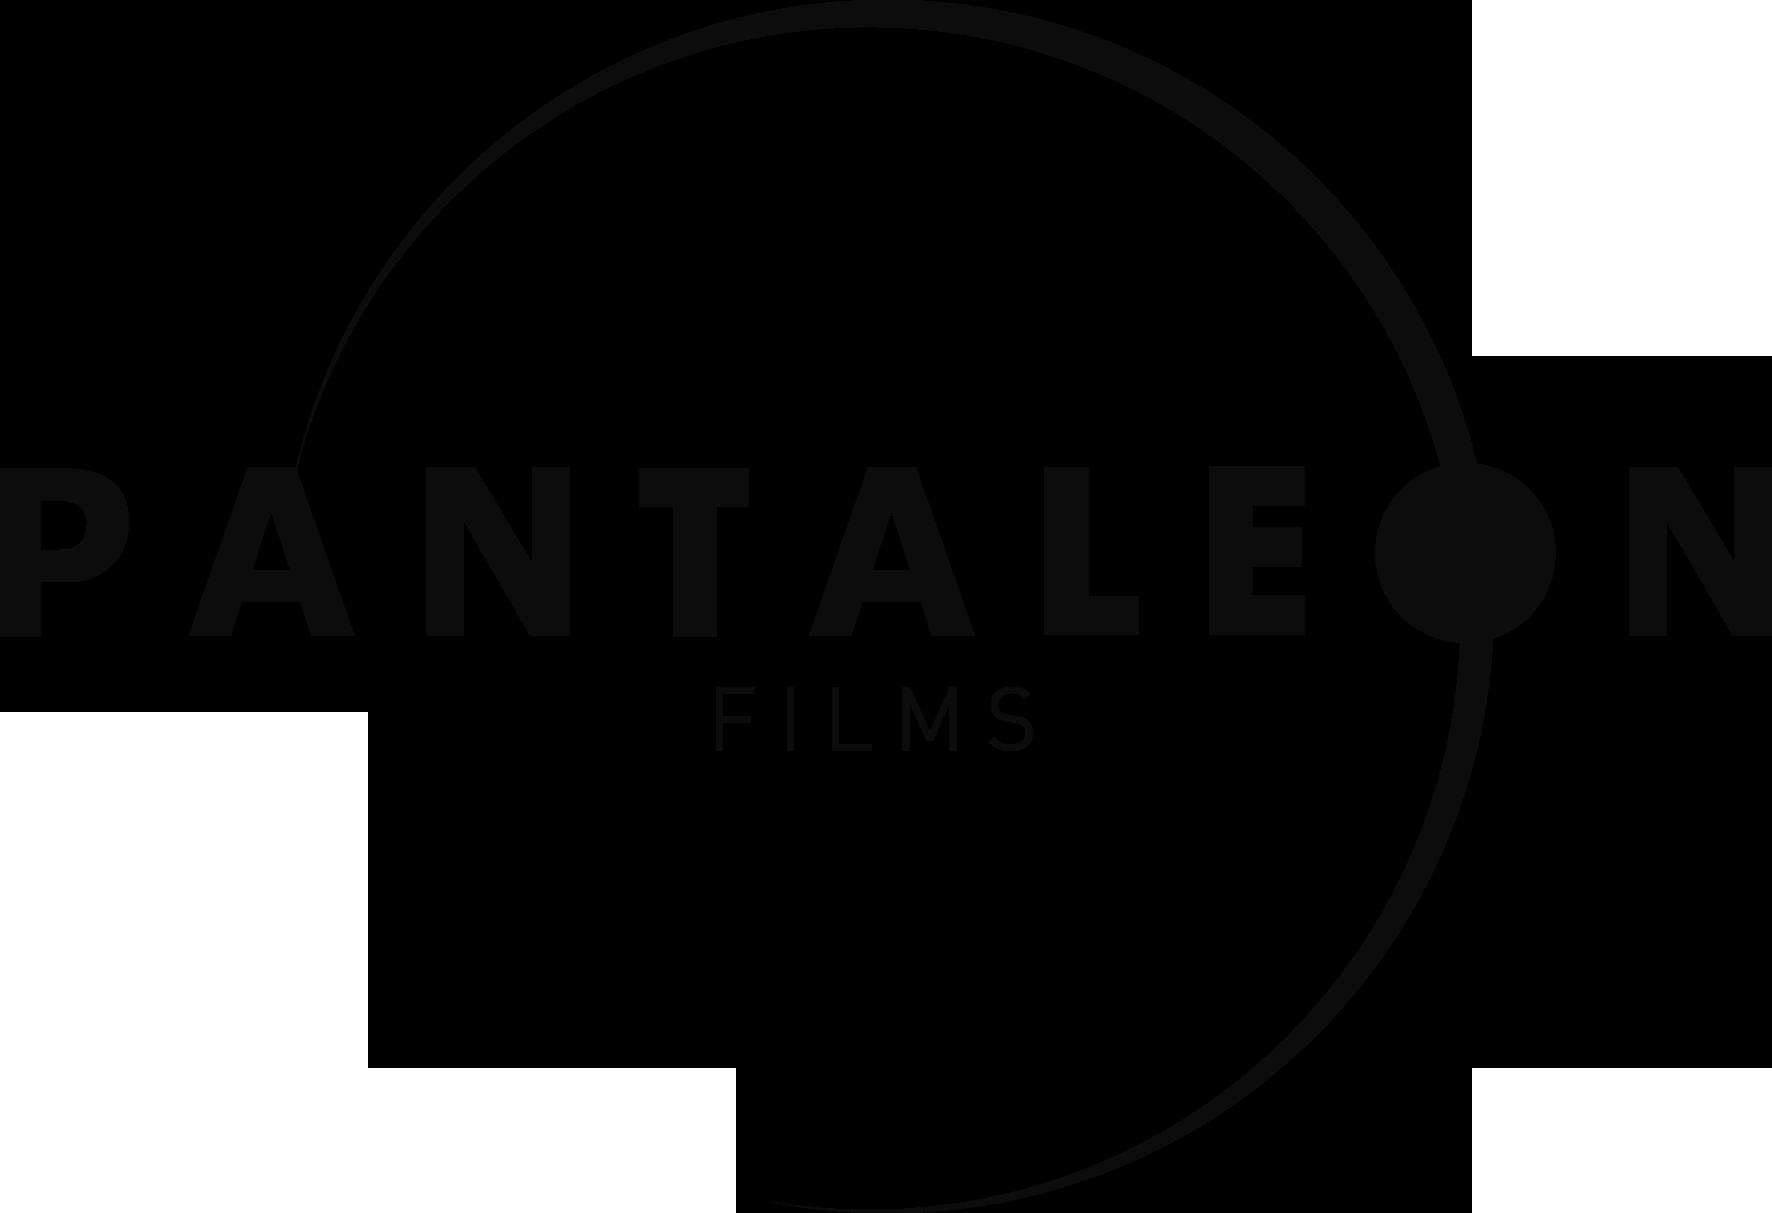 logo_pantaleon_films